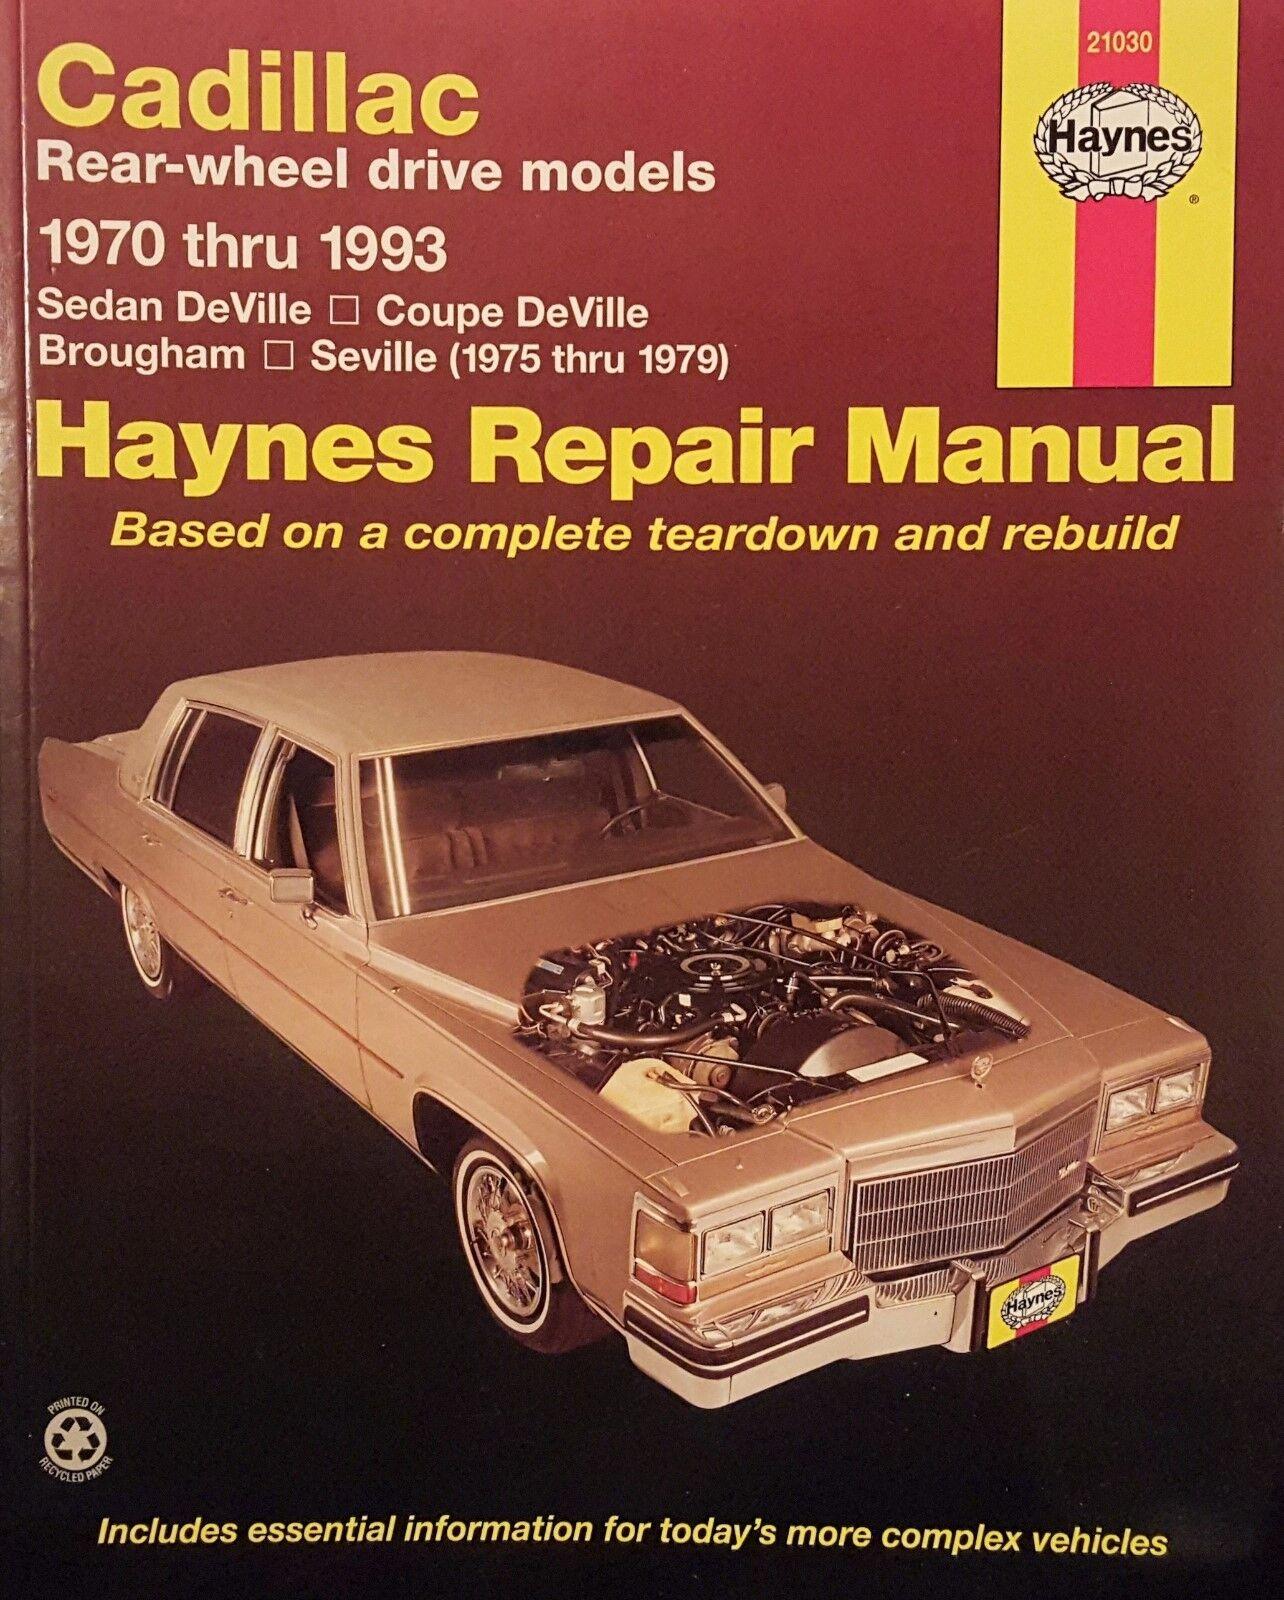 Stock photo. Stock photo; Haynes Publication 21030 Cadillac Rear Wheel  Drive Repair Service Manual ...